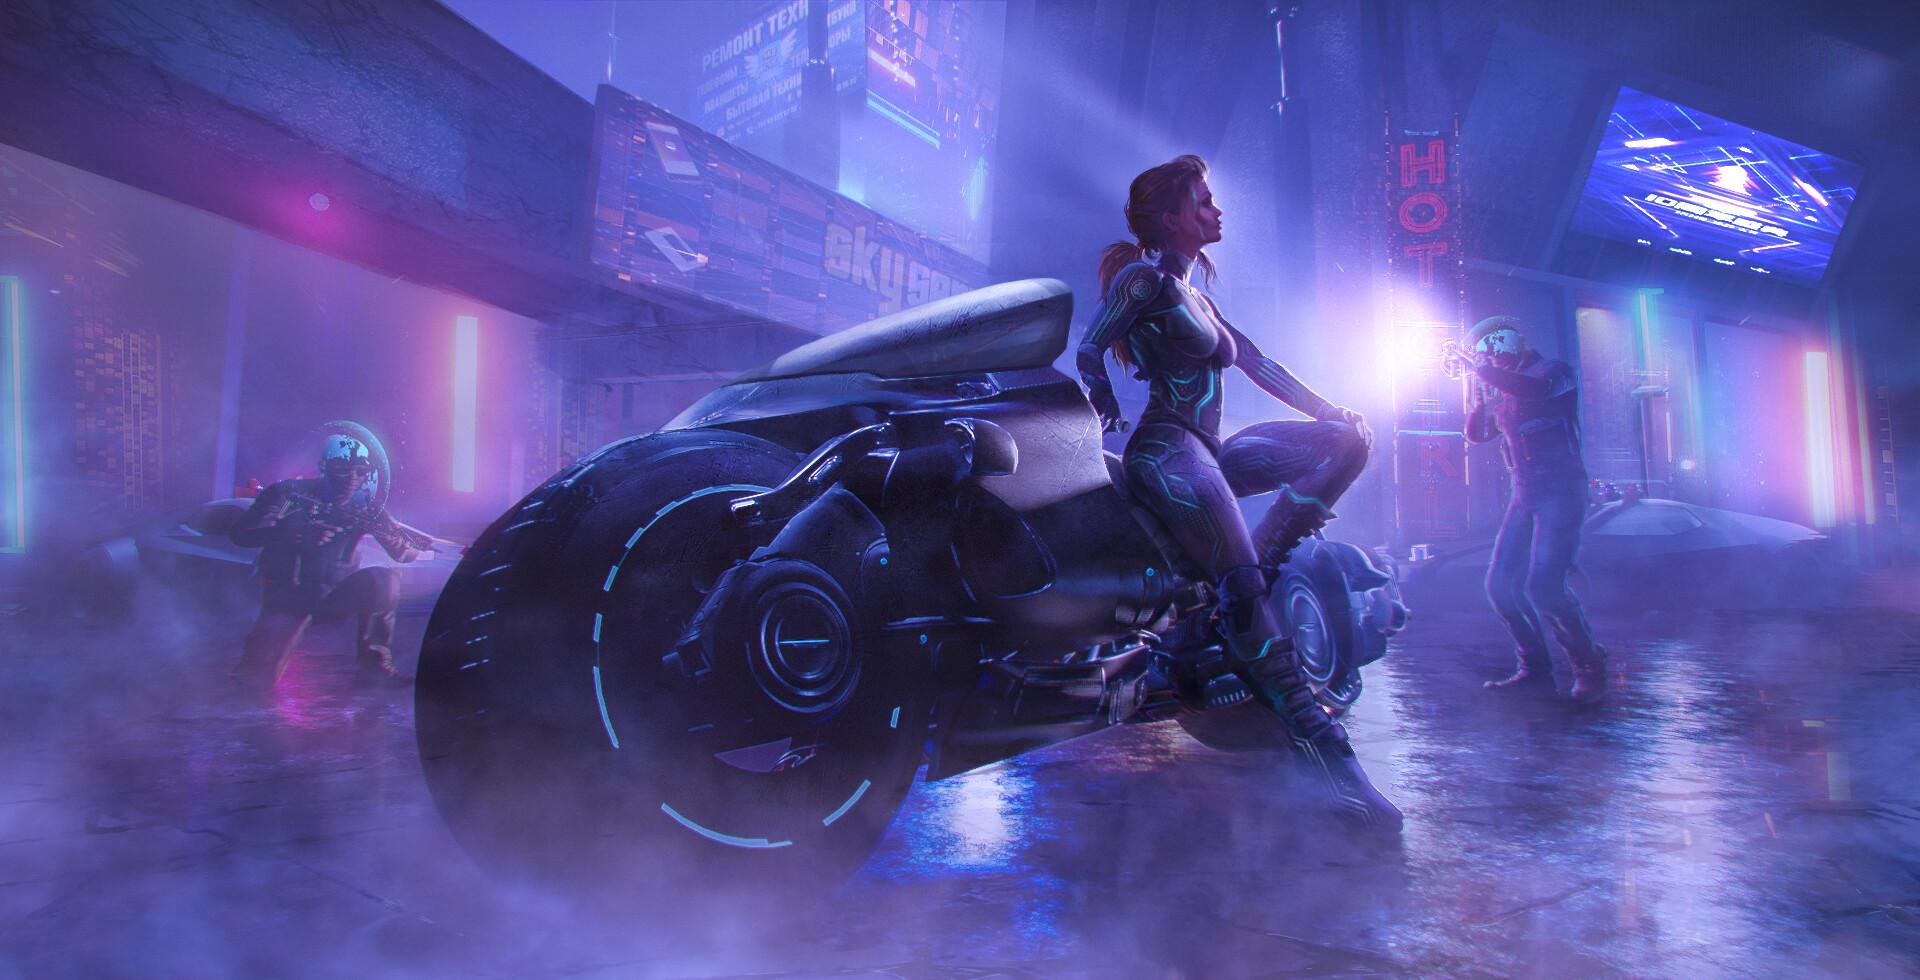 Artwork Women Motorcycle Vehicle Futuristic Science Fiction Science Fiction Women Women With Motorcy 1920x980